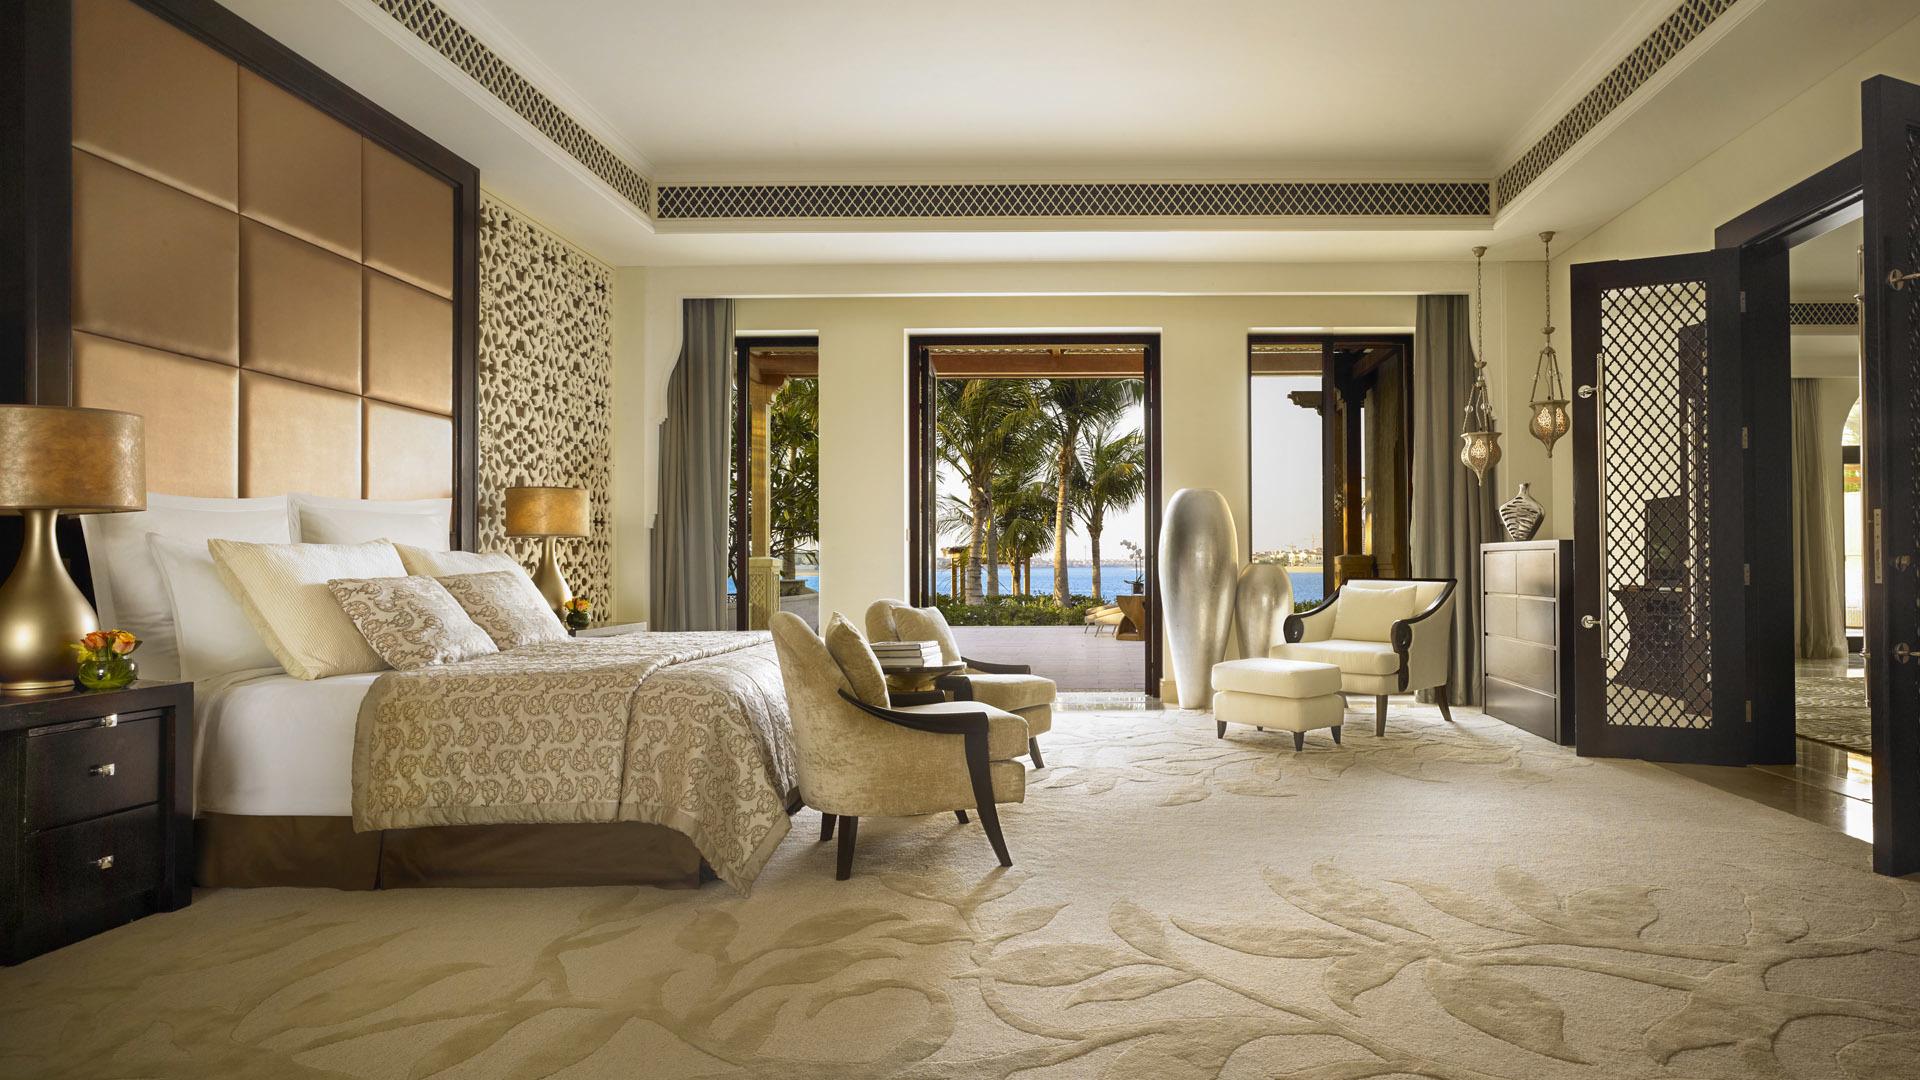 Фото отеля One&Only The Palm